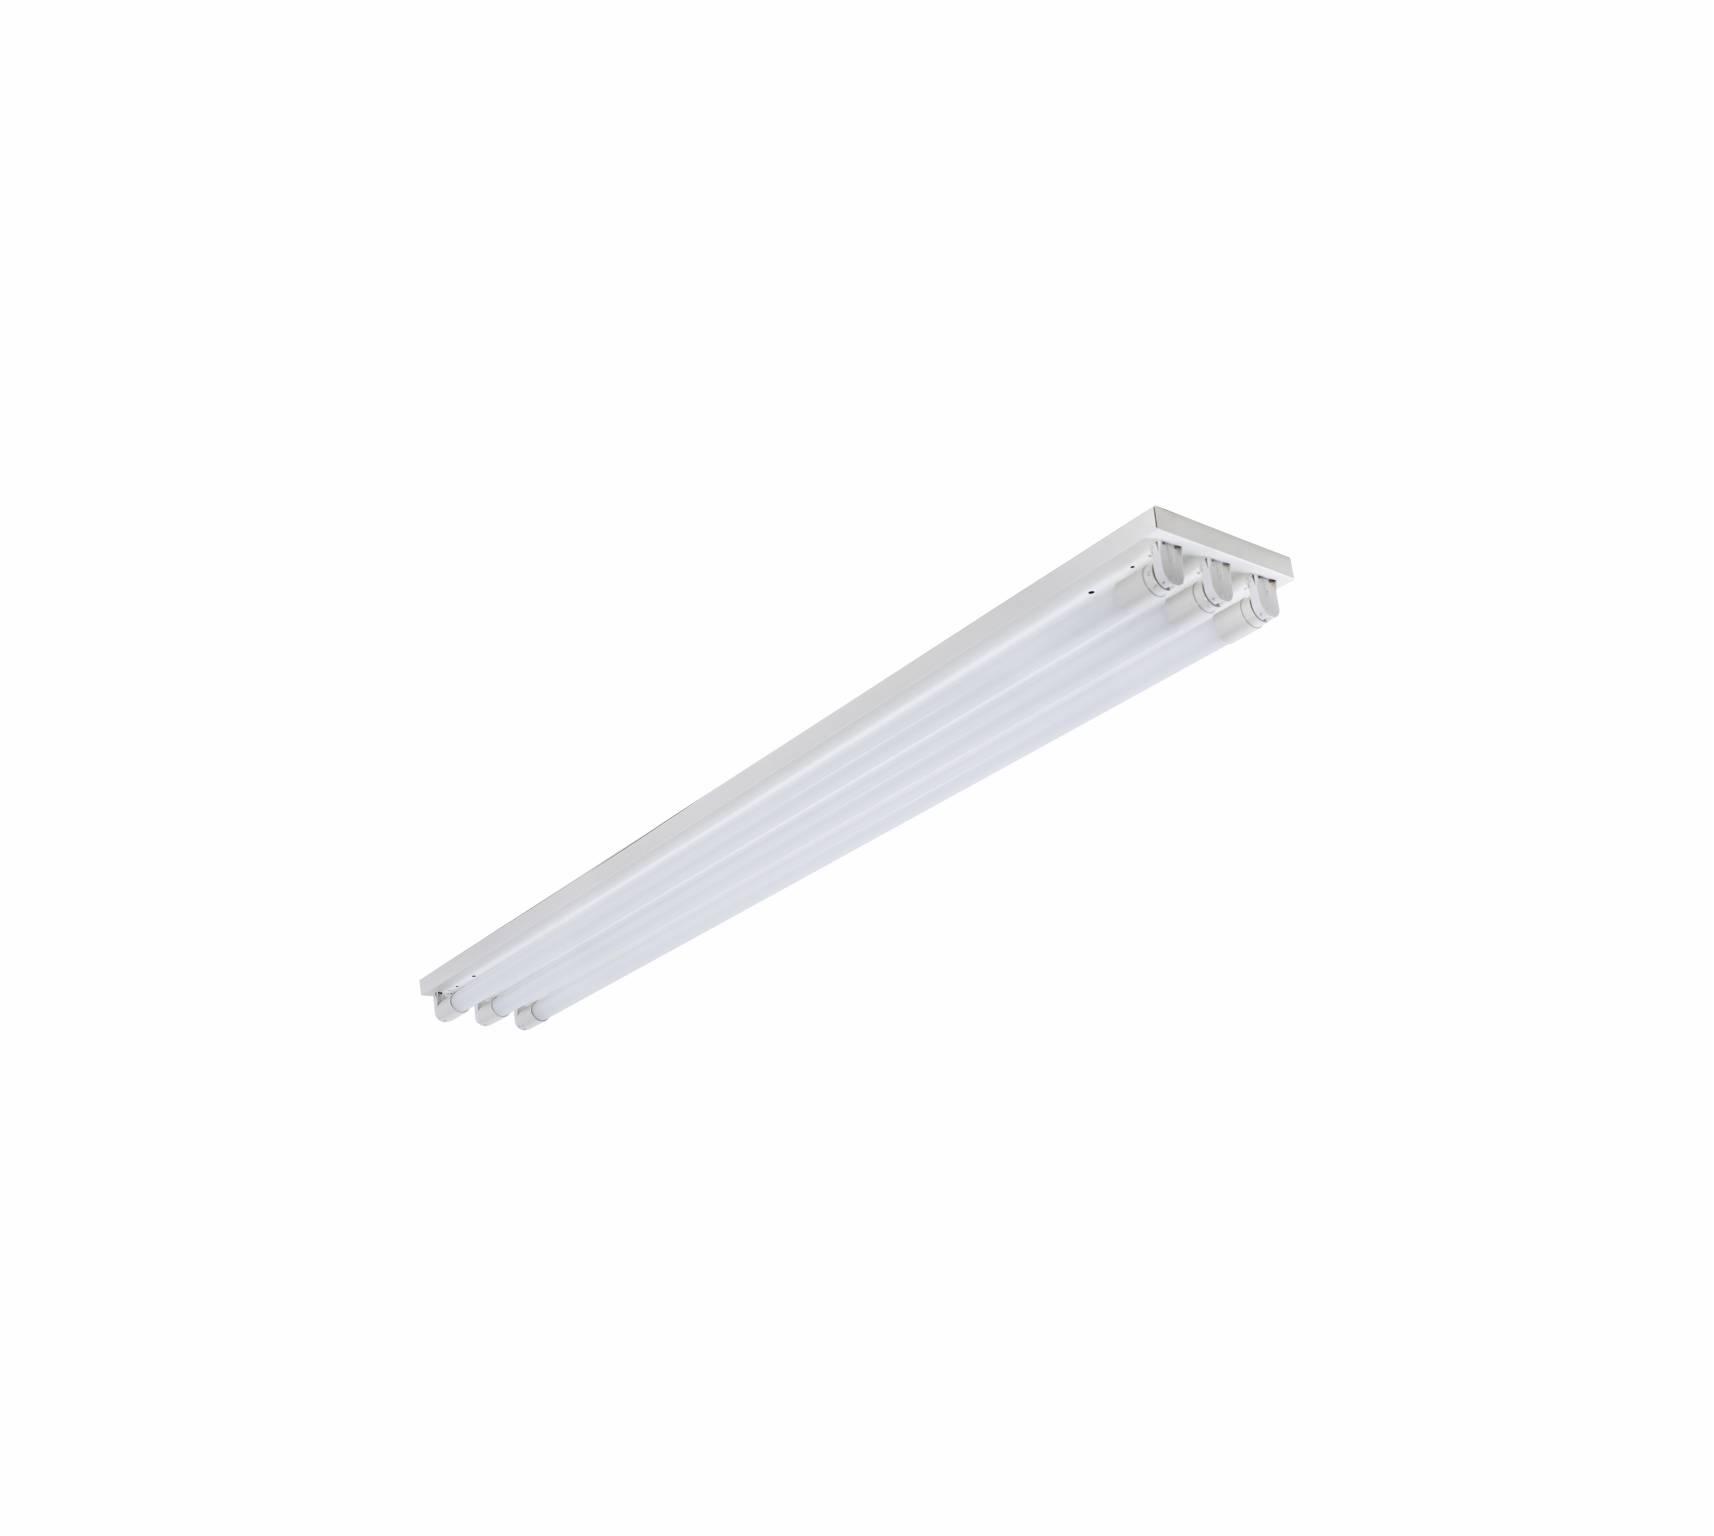 SLIMT8-LED-3X9,9W-65-3C <span>(caixa)</span><br/>